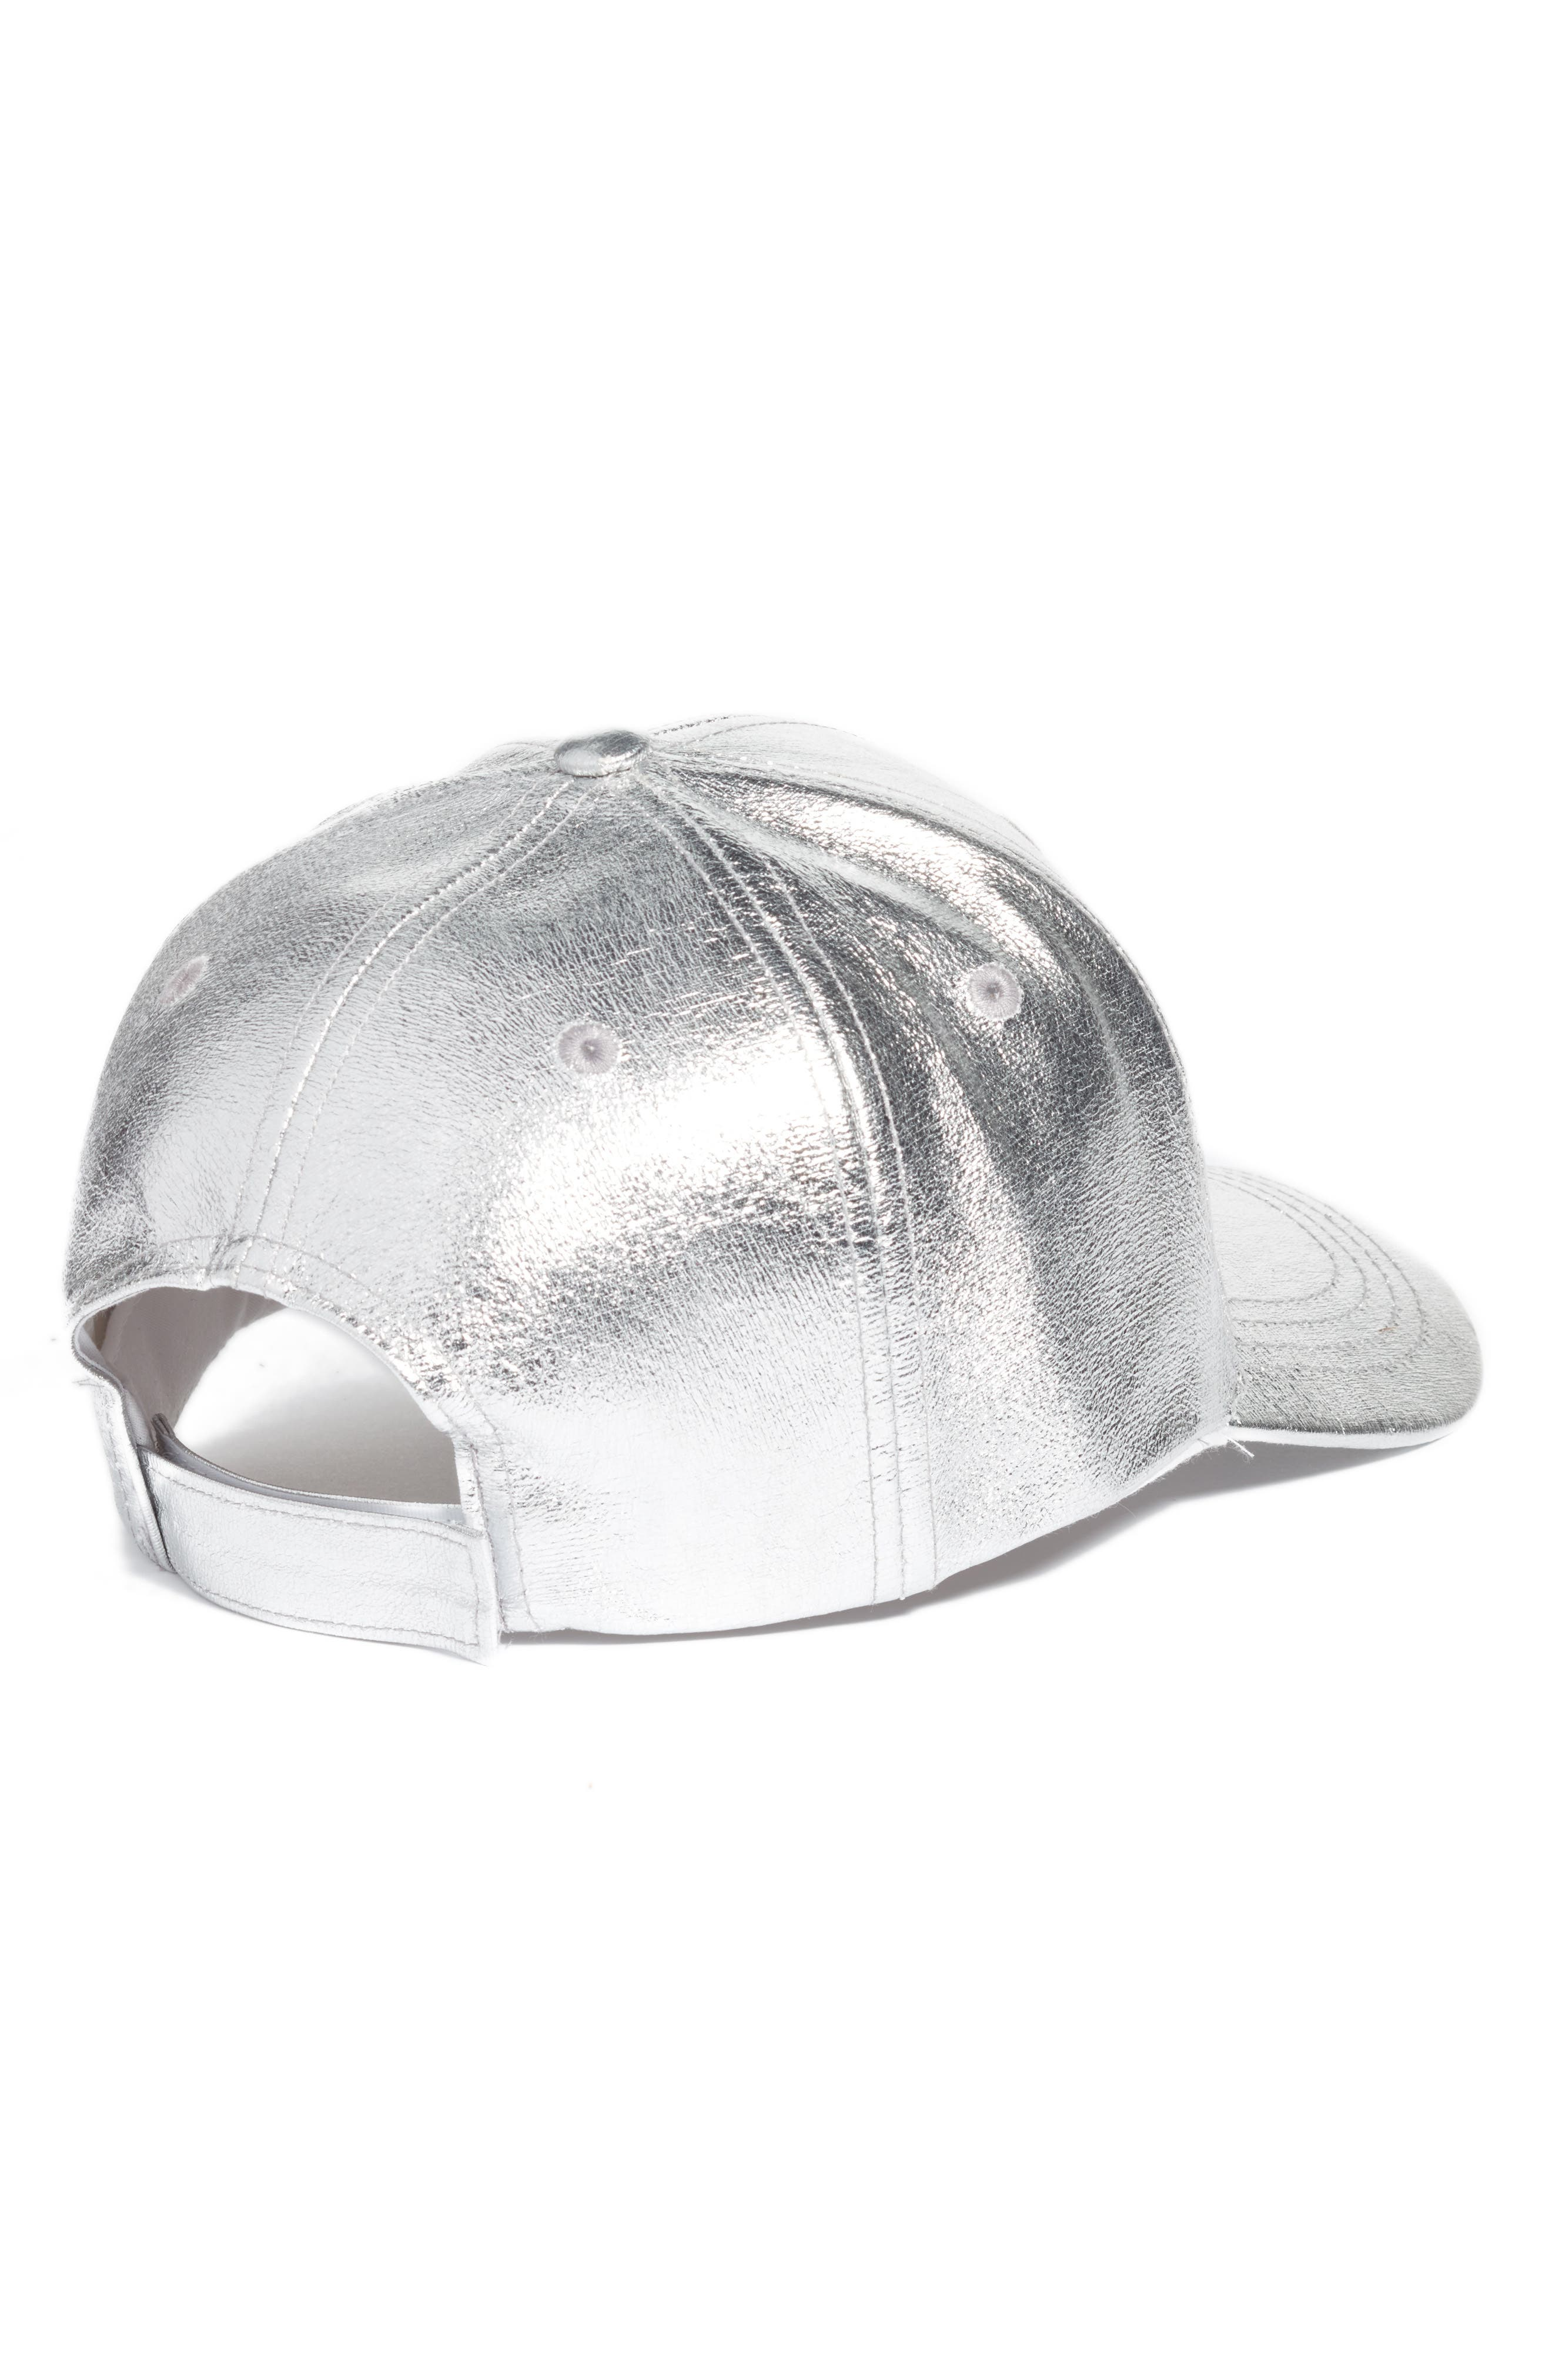 Crackled Metallic Baseball Cap,                             Alternate thumbnail 4, color,